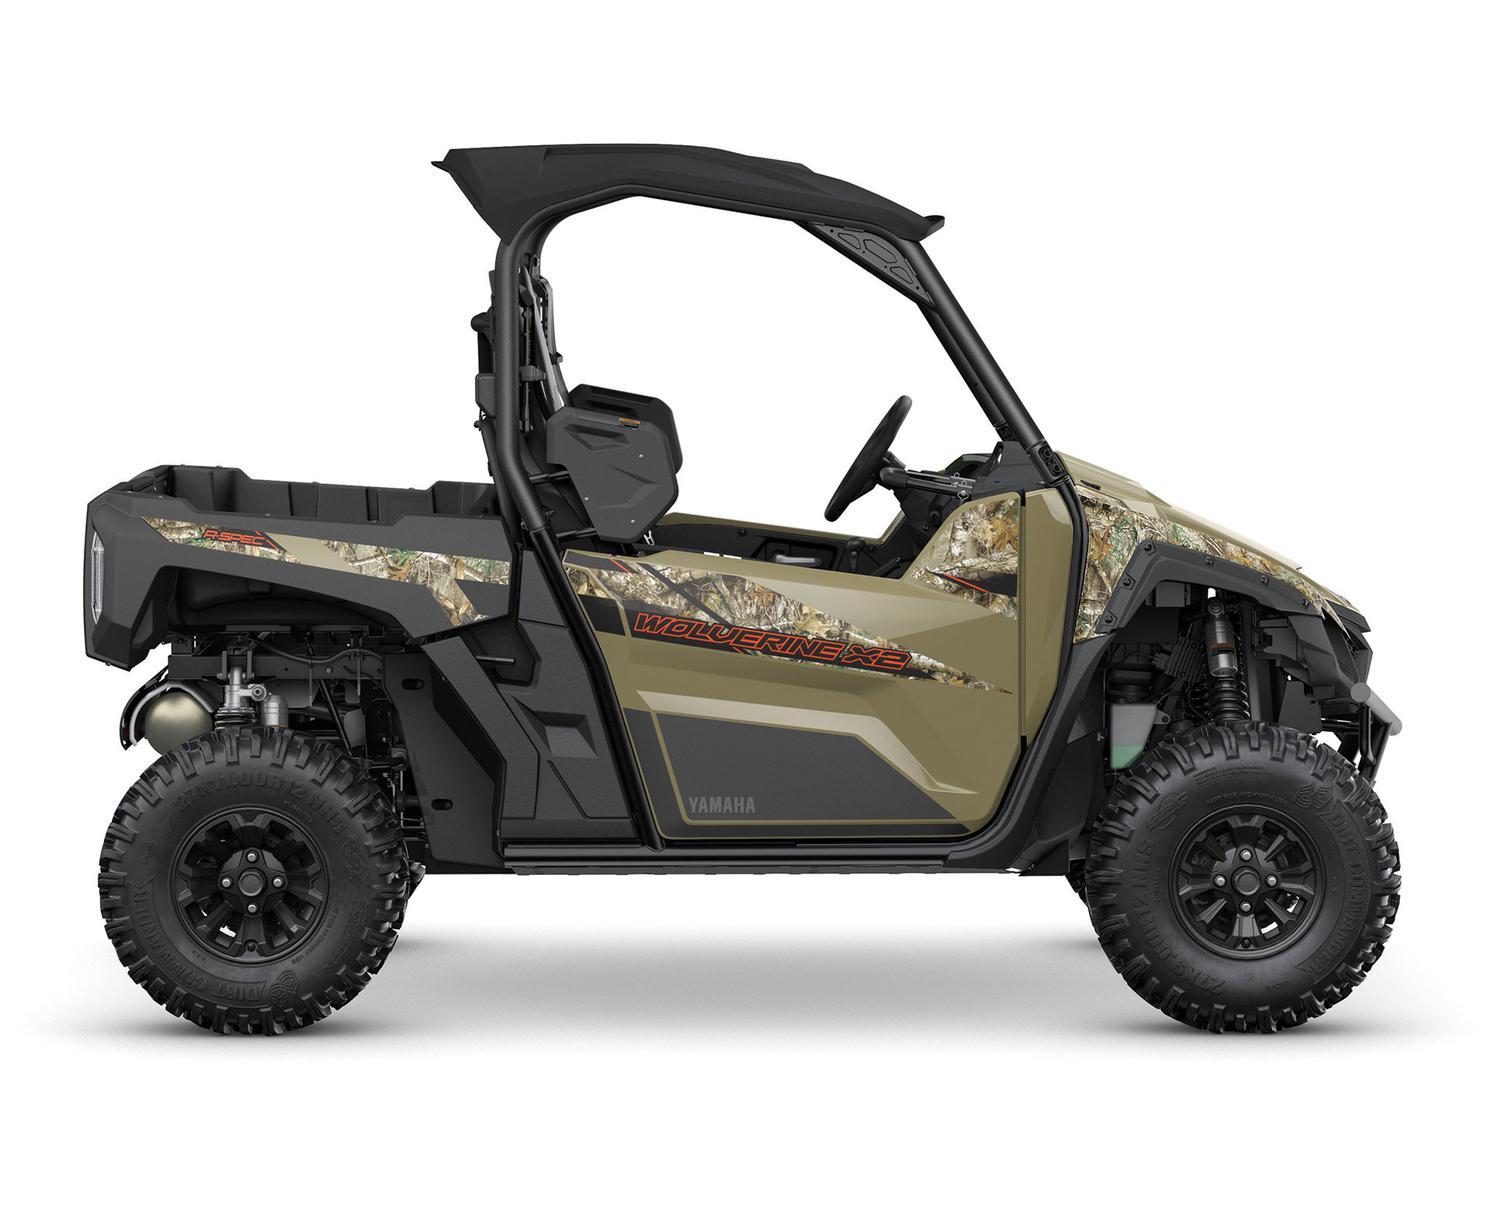 Yamaha Wolverine X2 R-SPEC à DAE Camouflage Realtree Edge 2021